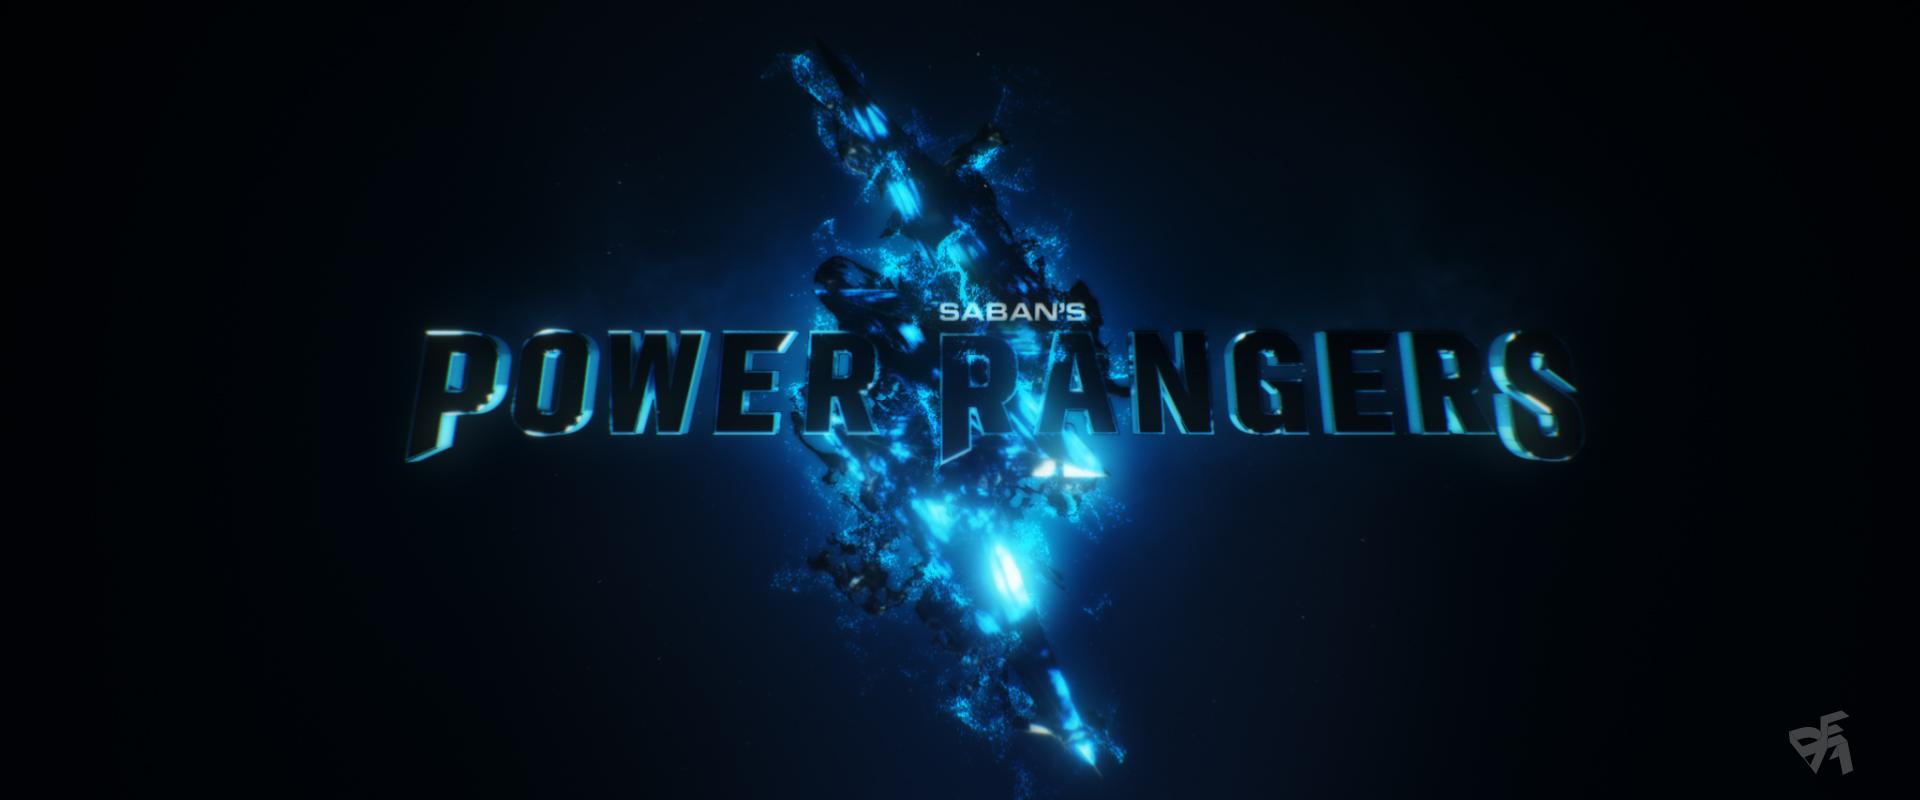 PowerRangers_STYLEFRAME_06.jpg